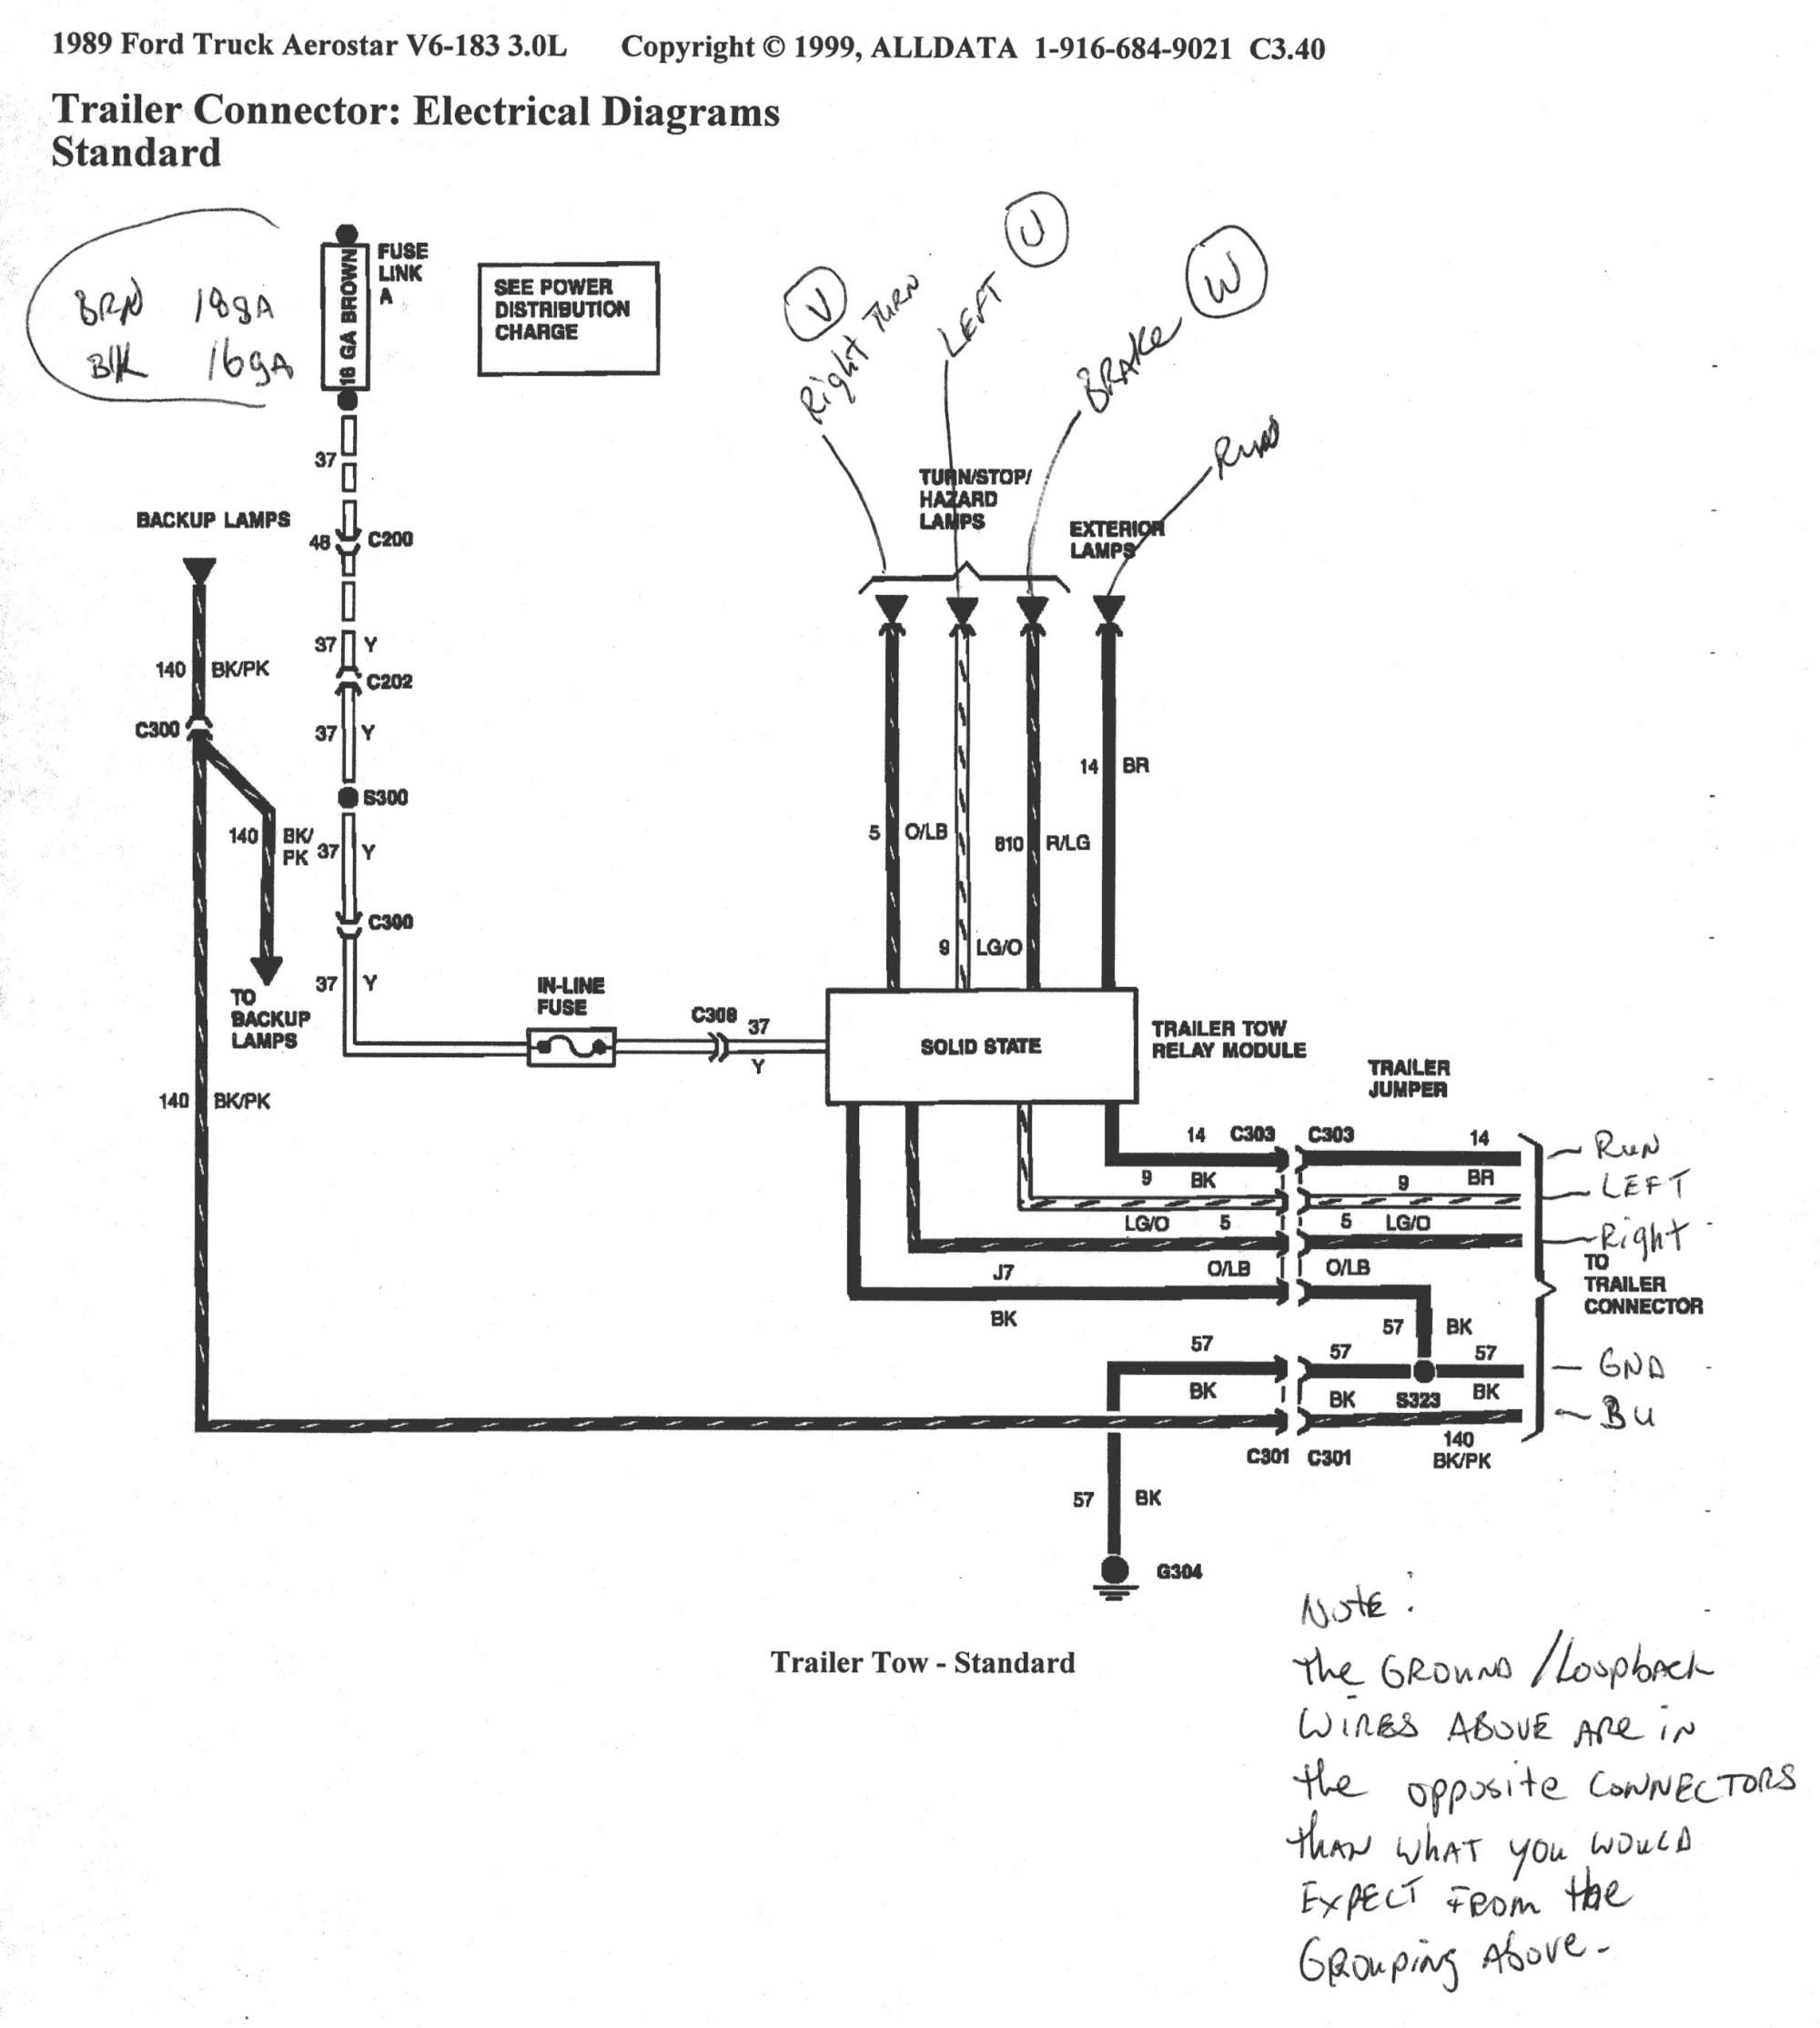 hight resolution of 2006 honda ridgeline trailer wiring diagram free wiring diagram 2006 honda ridgeline trailer wiring diagram